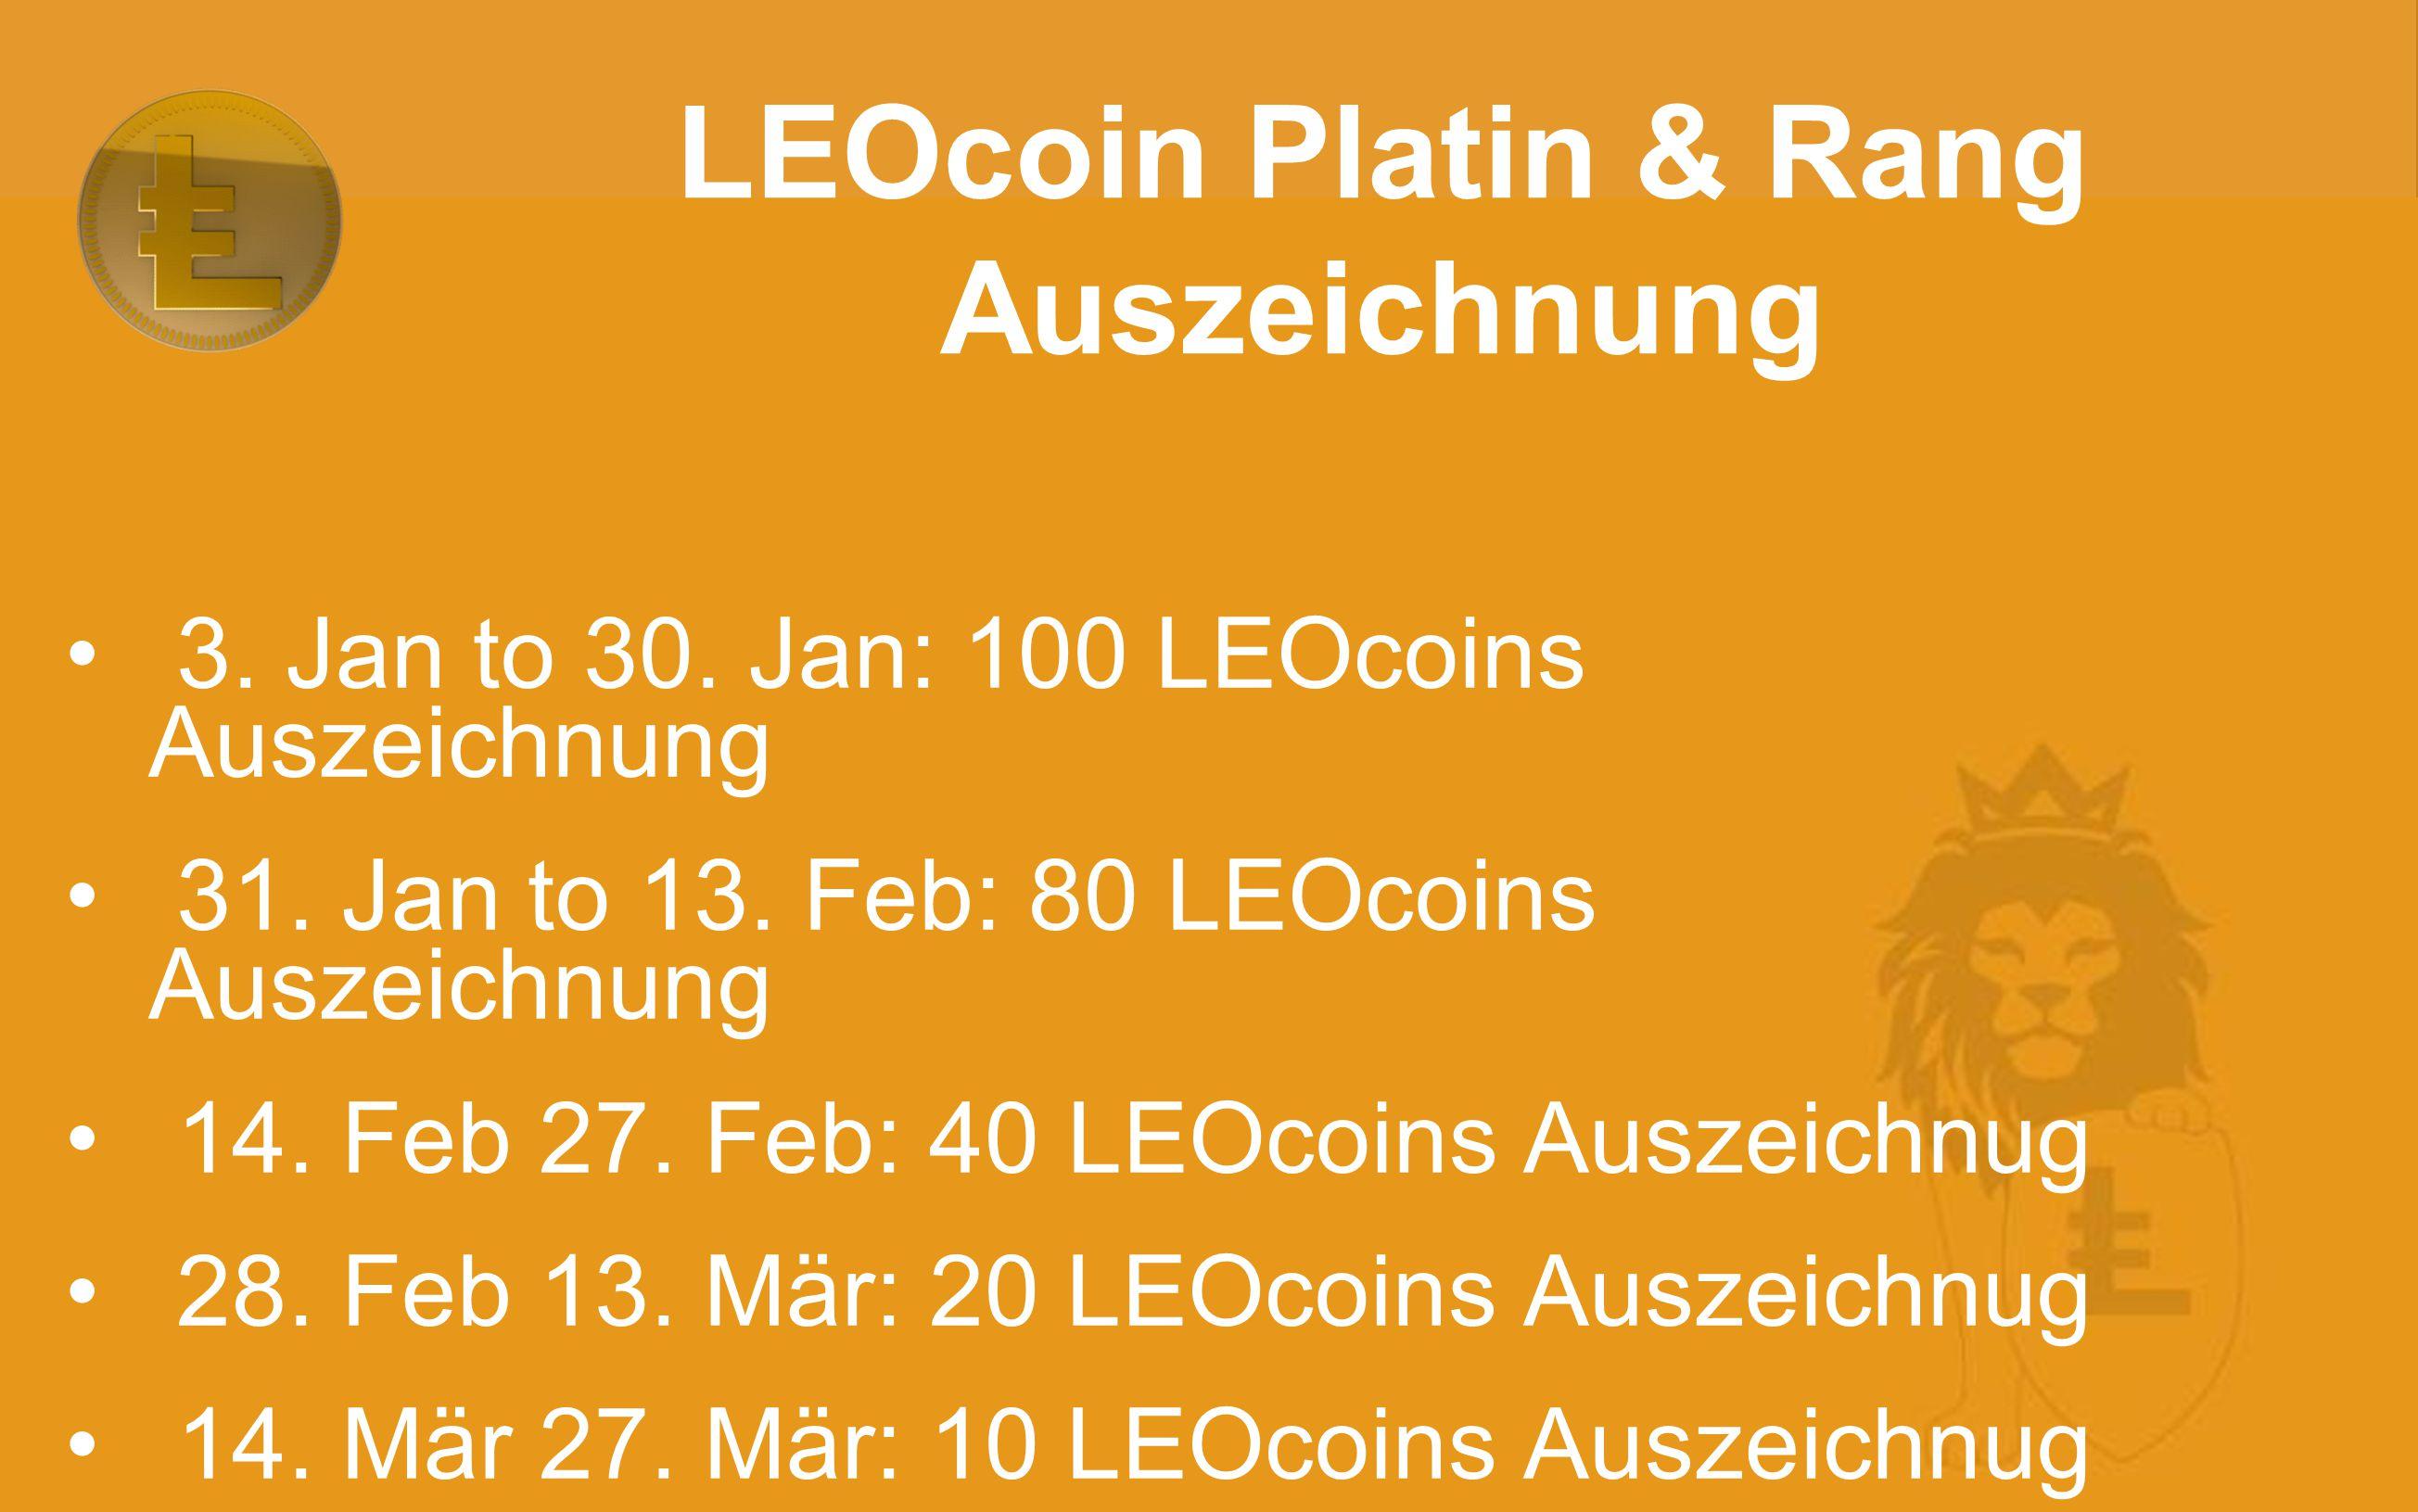 LEOcoin Platinum & Rank award 3.Jan bis 30. Jan100 LEOcoins Ausz.